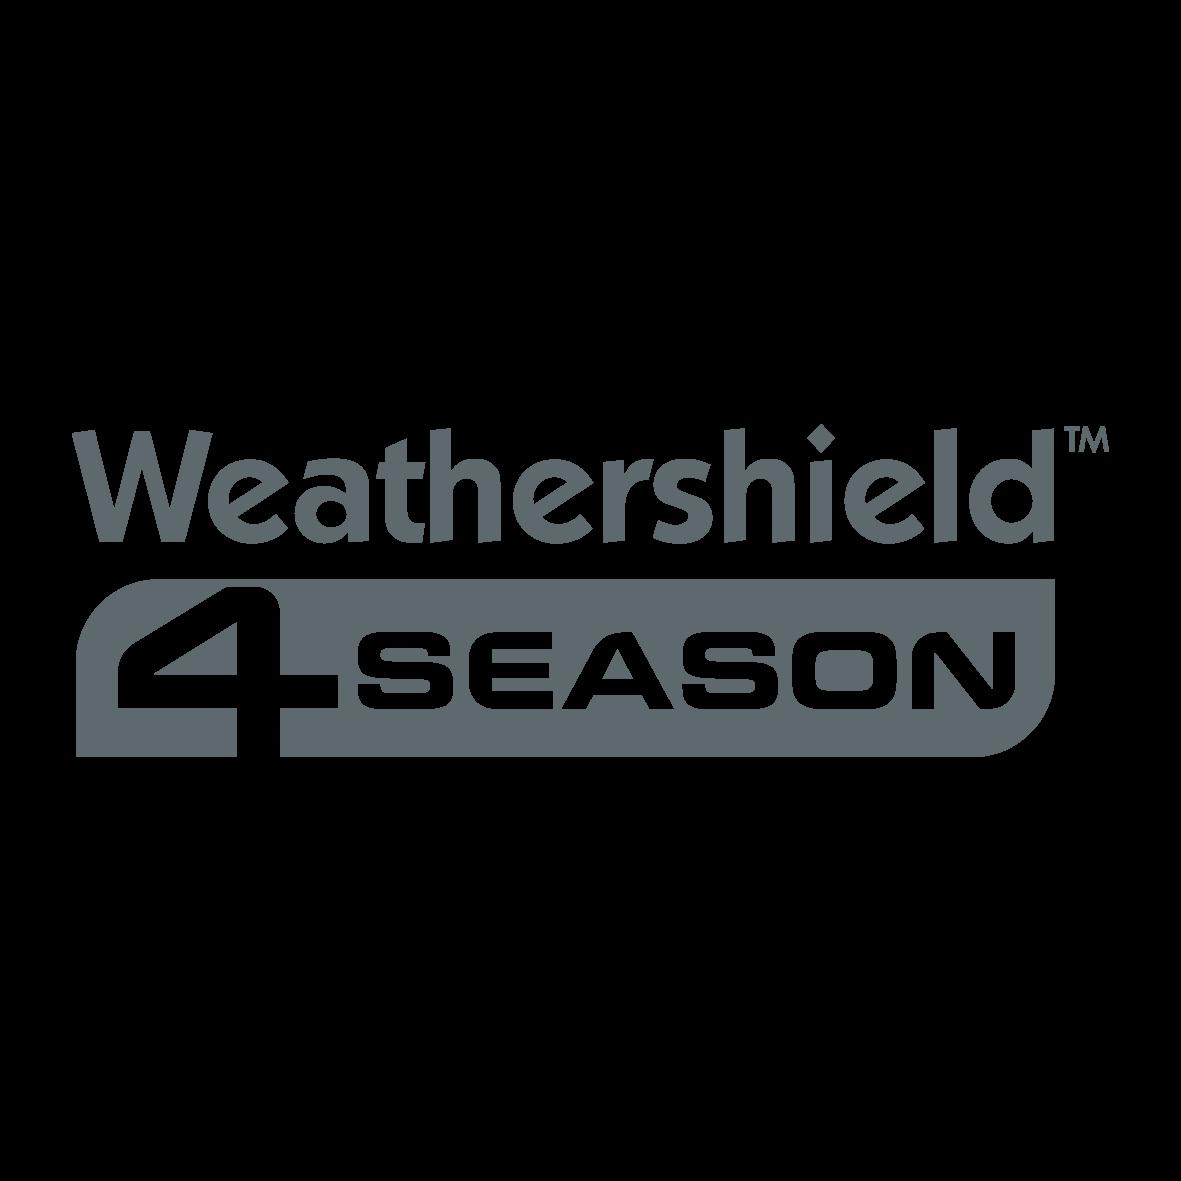 Weathershield 4 Season Logo Charcoal